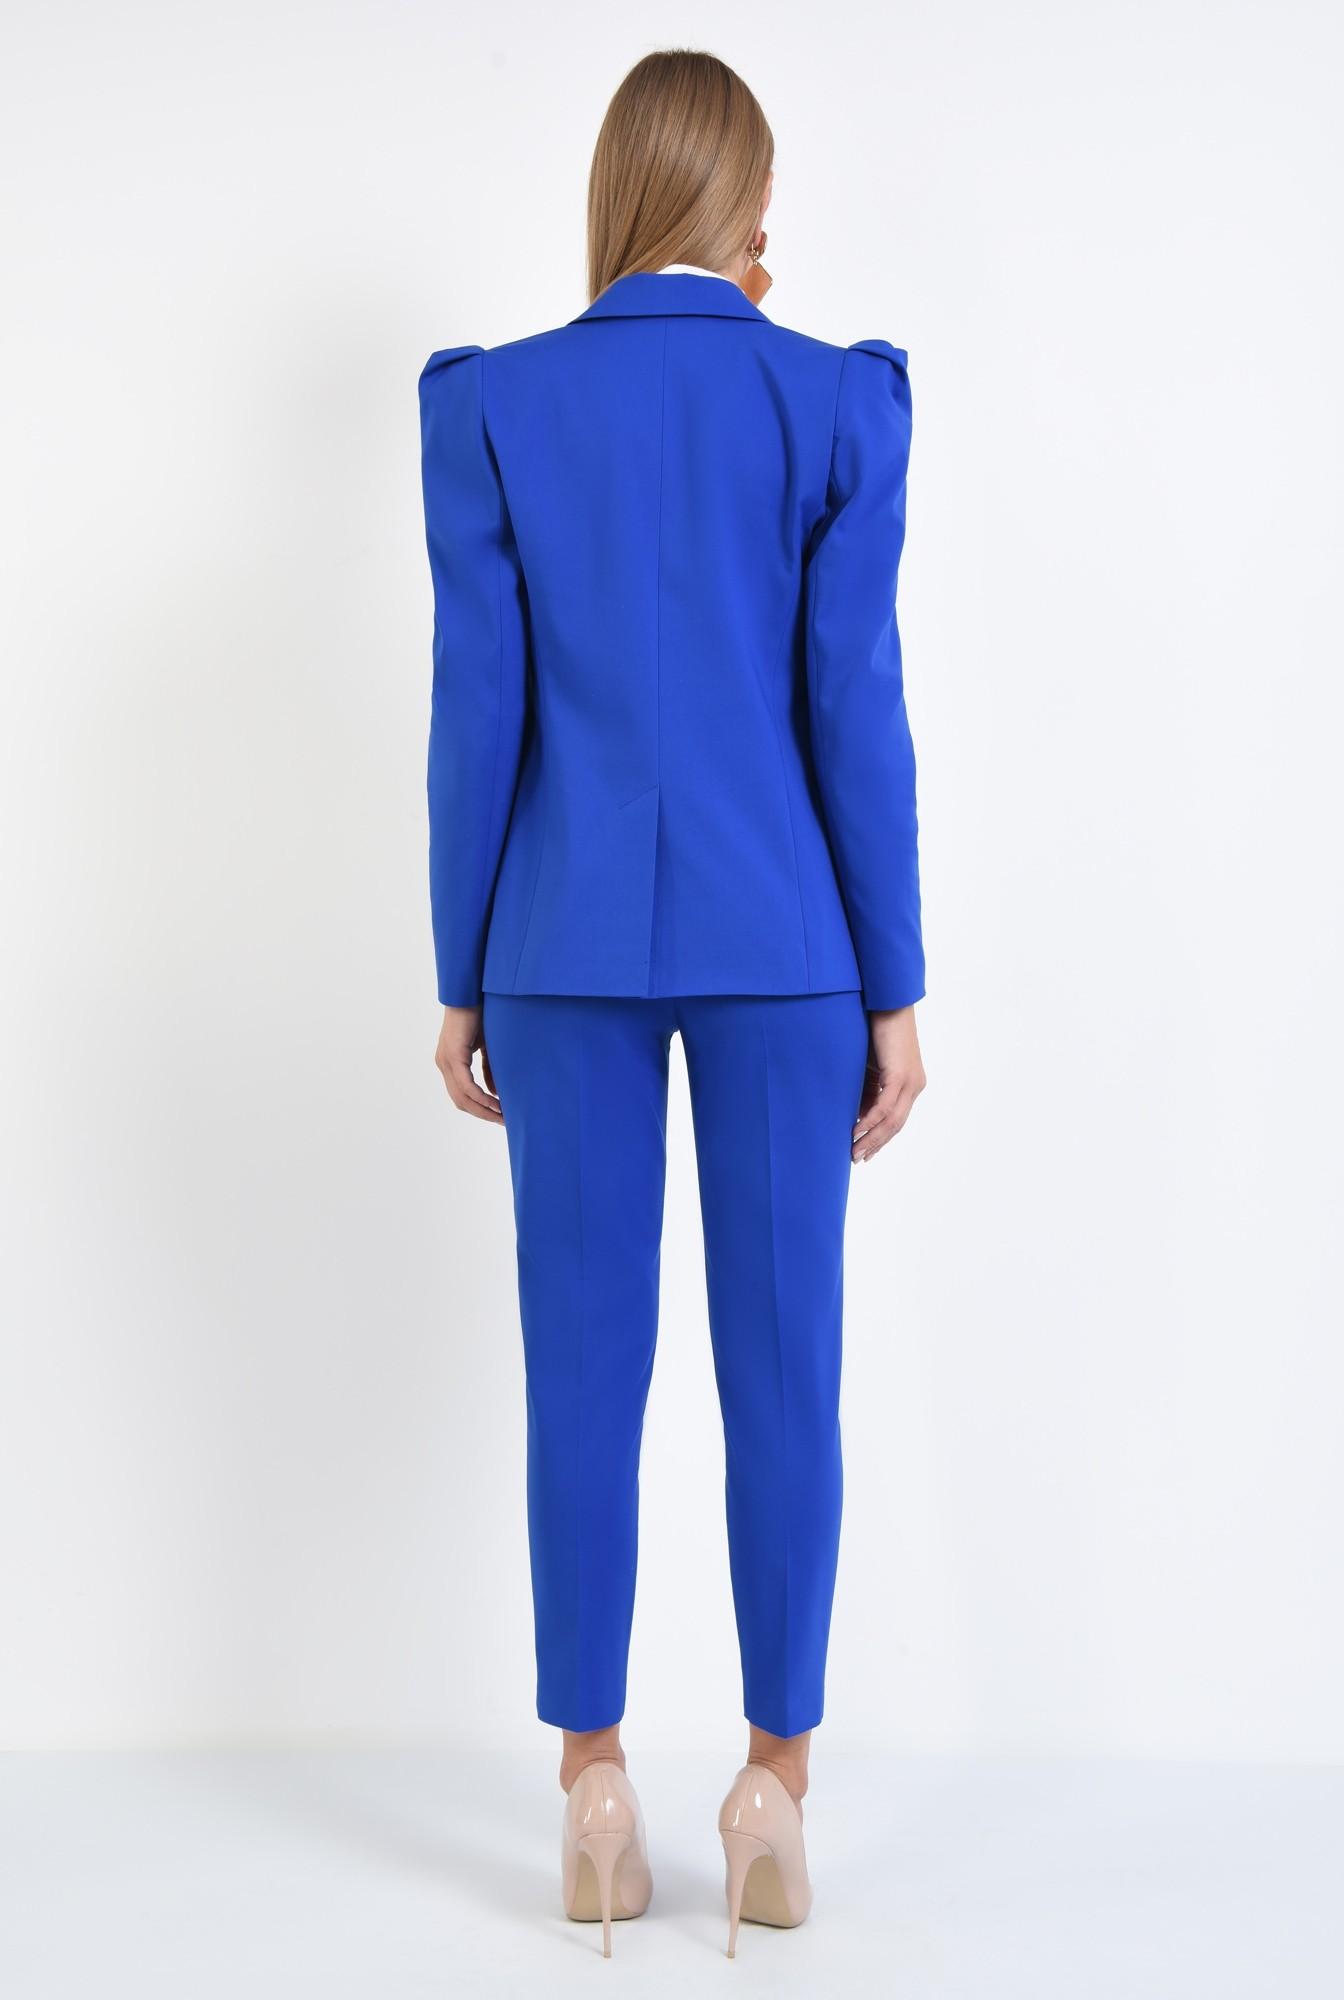 1 - pantaloni dama, online, costum, albastru, croi conic